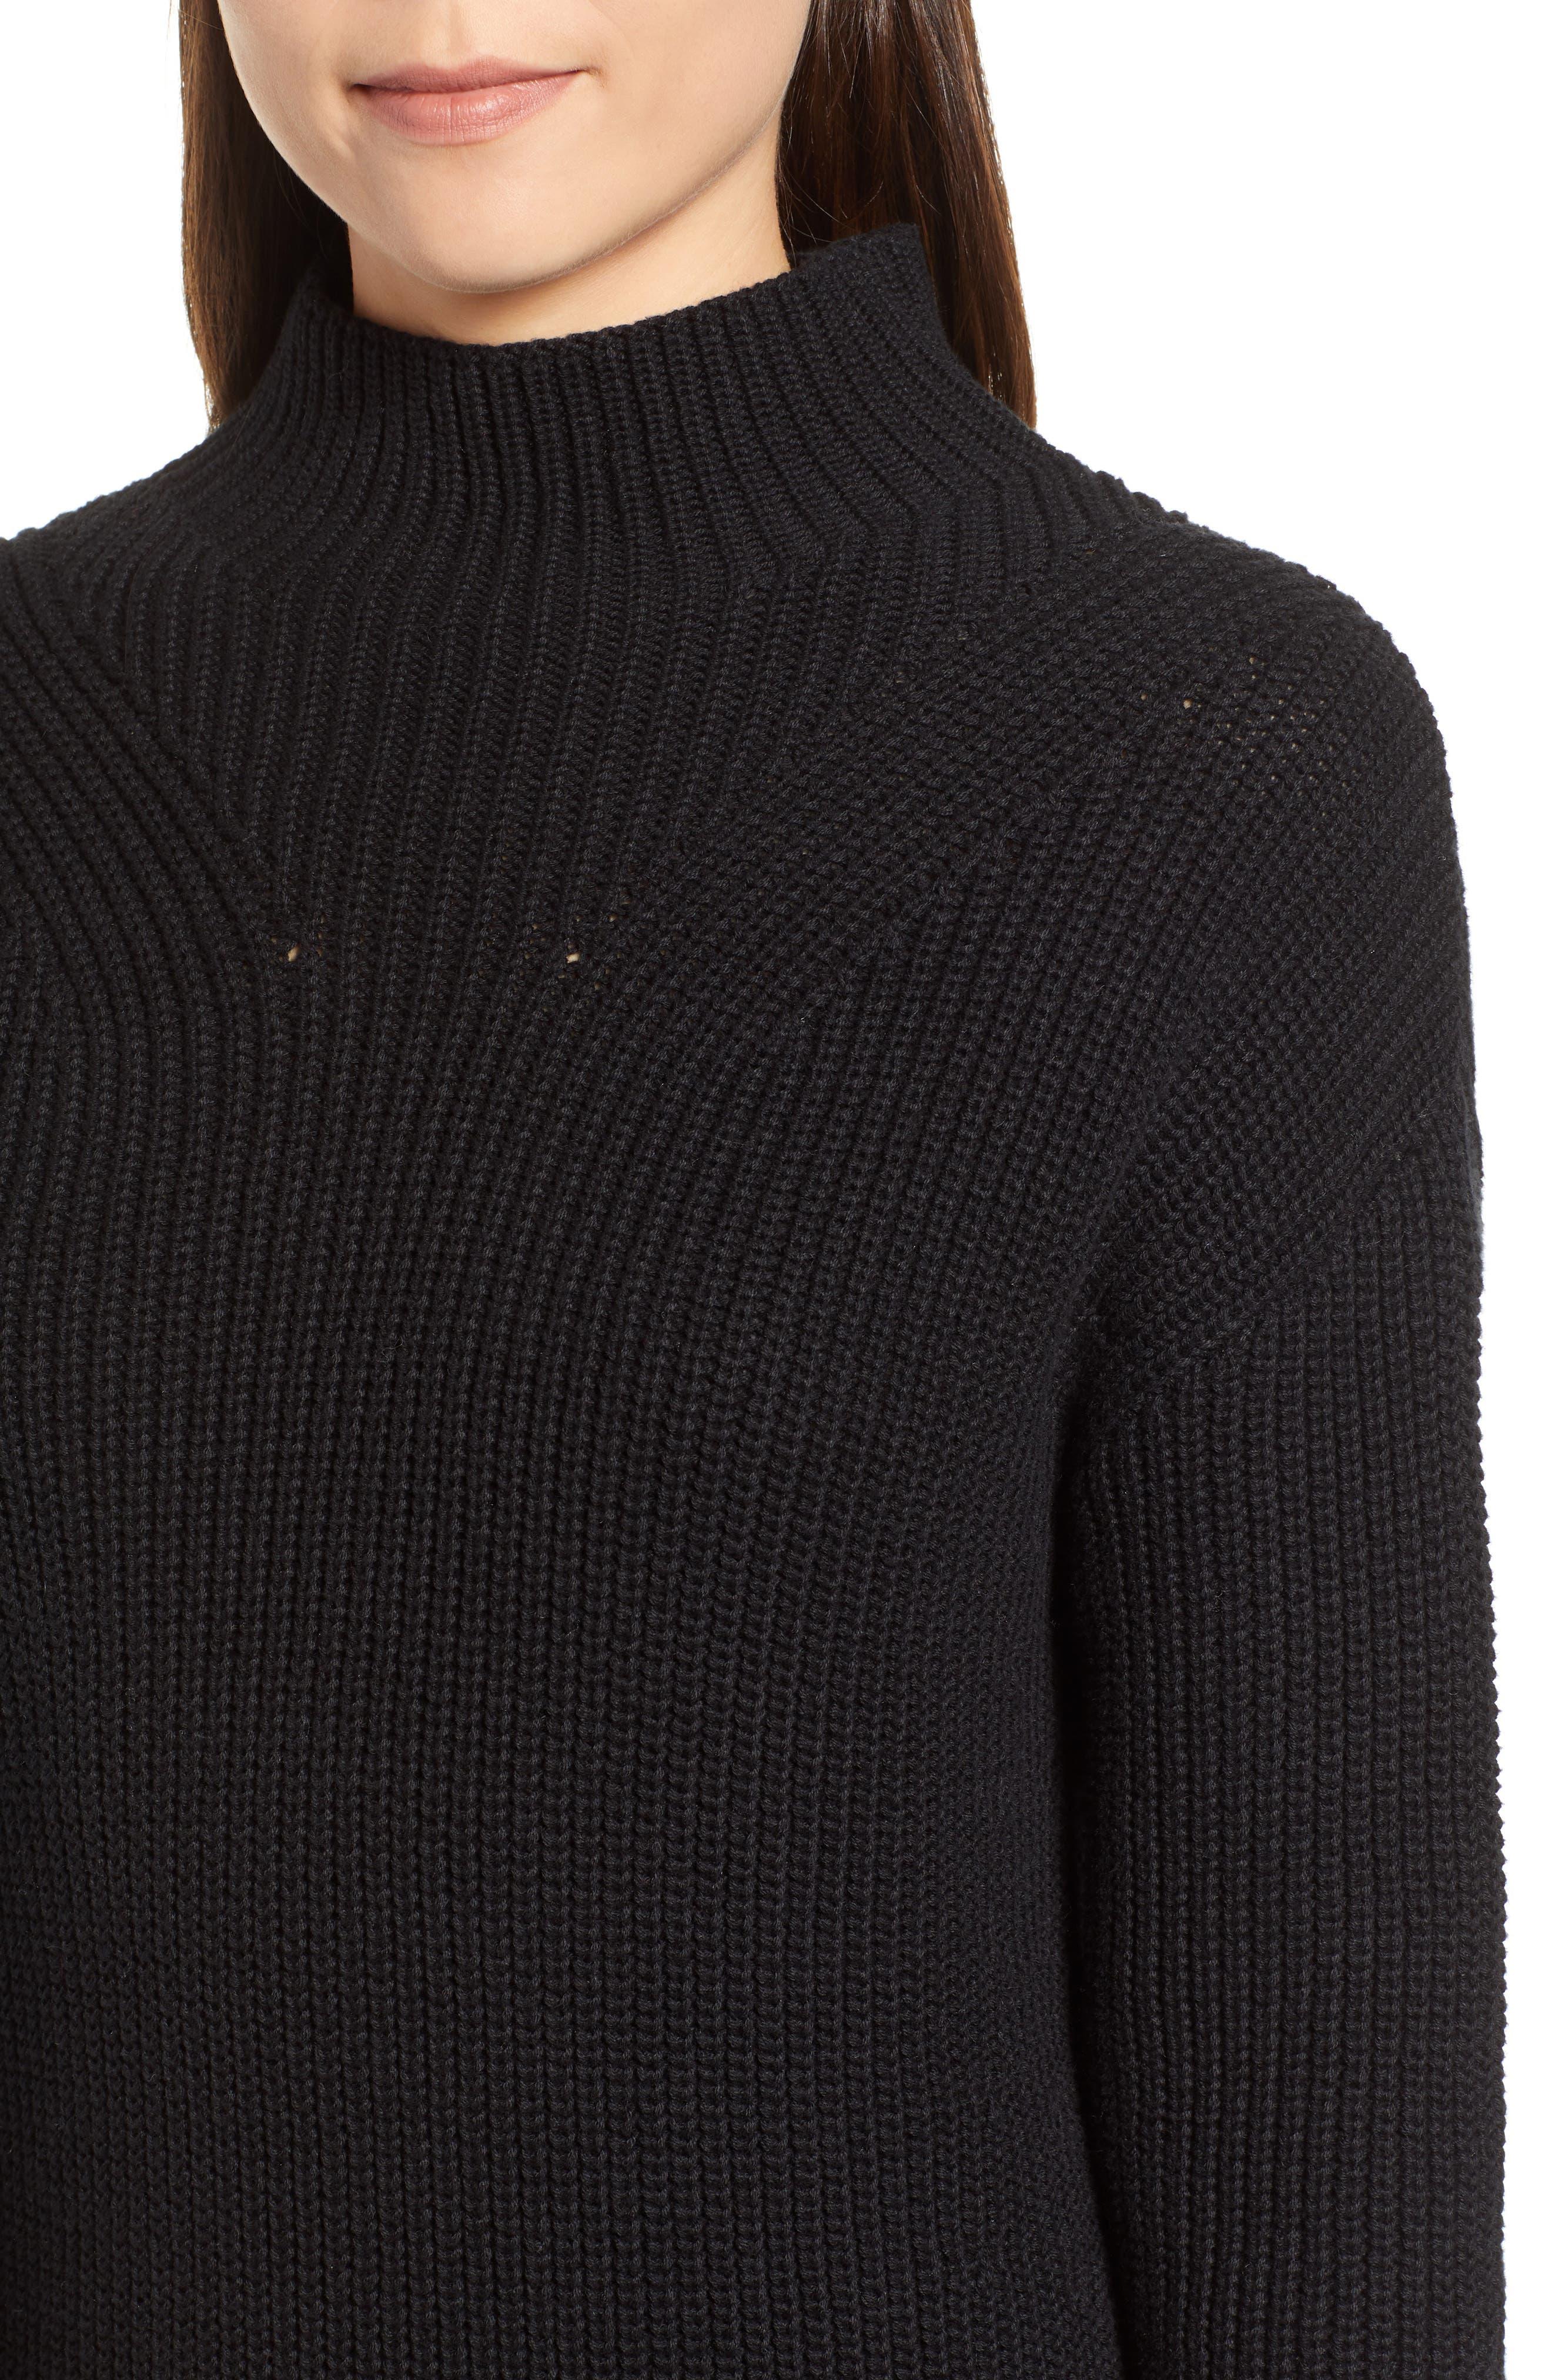 Ribbed Sweater Dress,                             Alternate thumbnail 4, color,                             BLACK